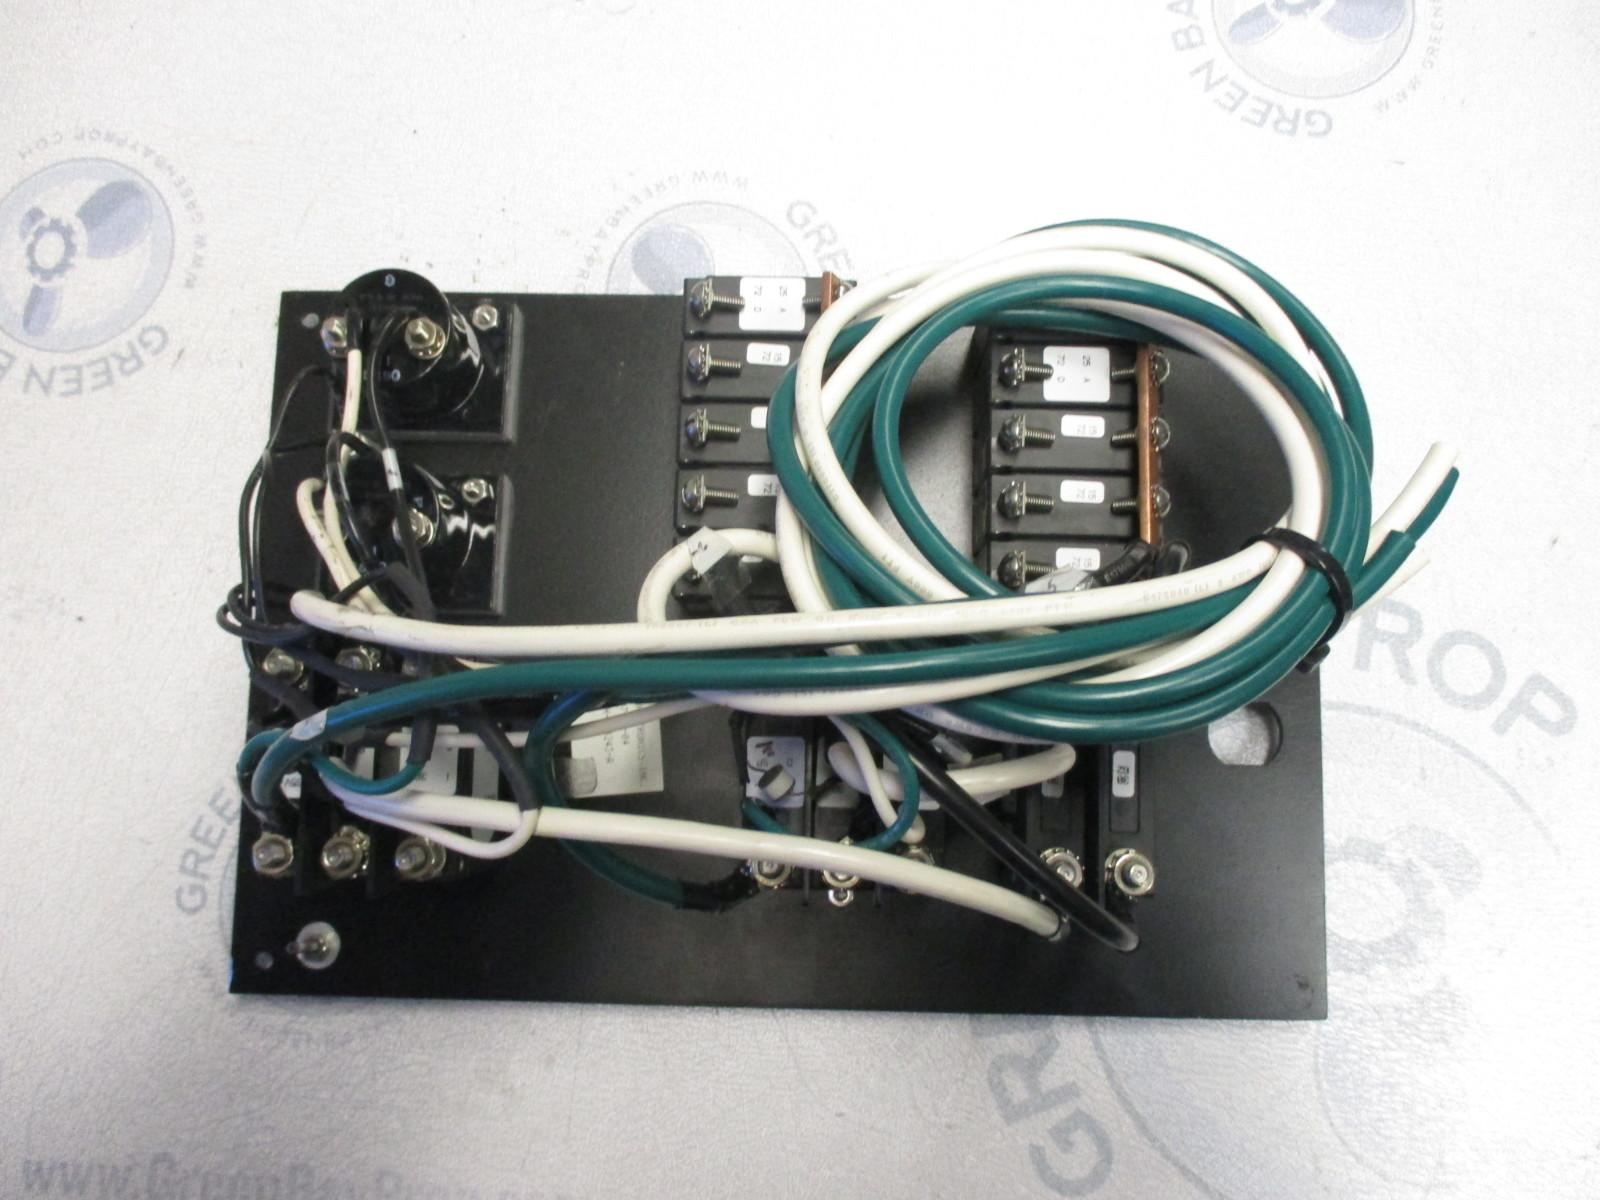 hight resolution of  marine boat breaker panel main controls 120v 60hz ac system